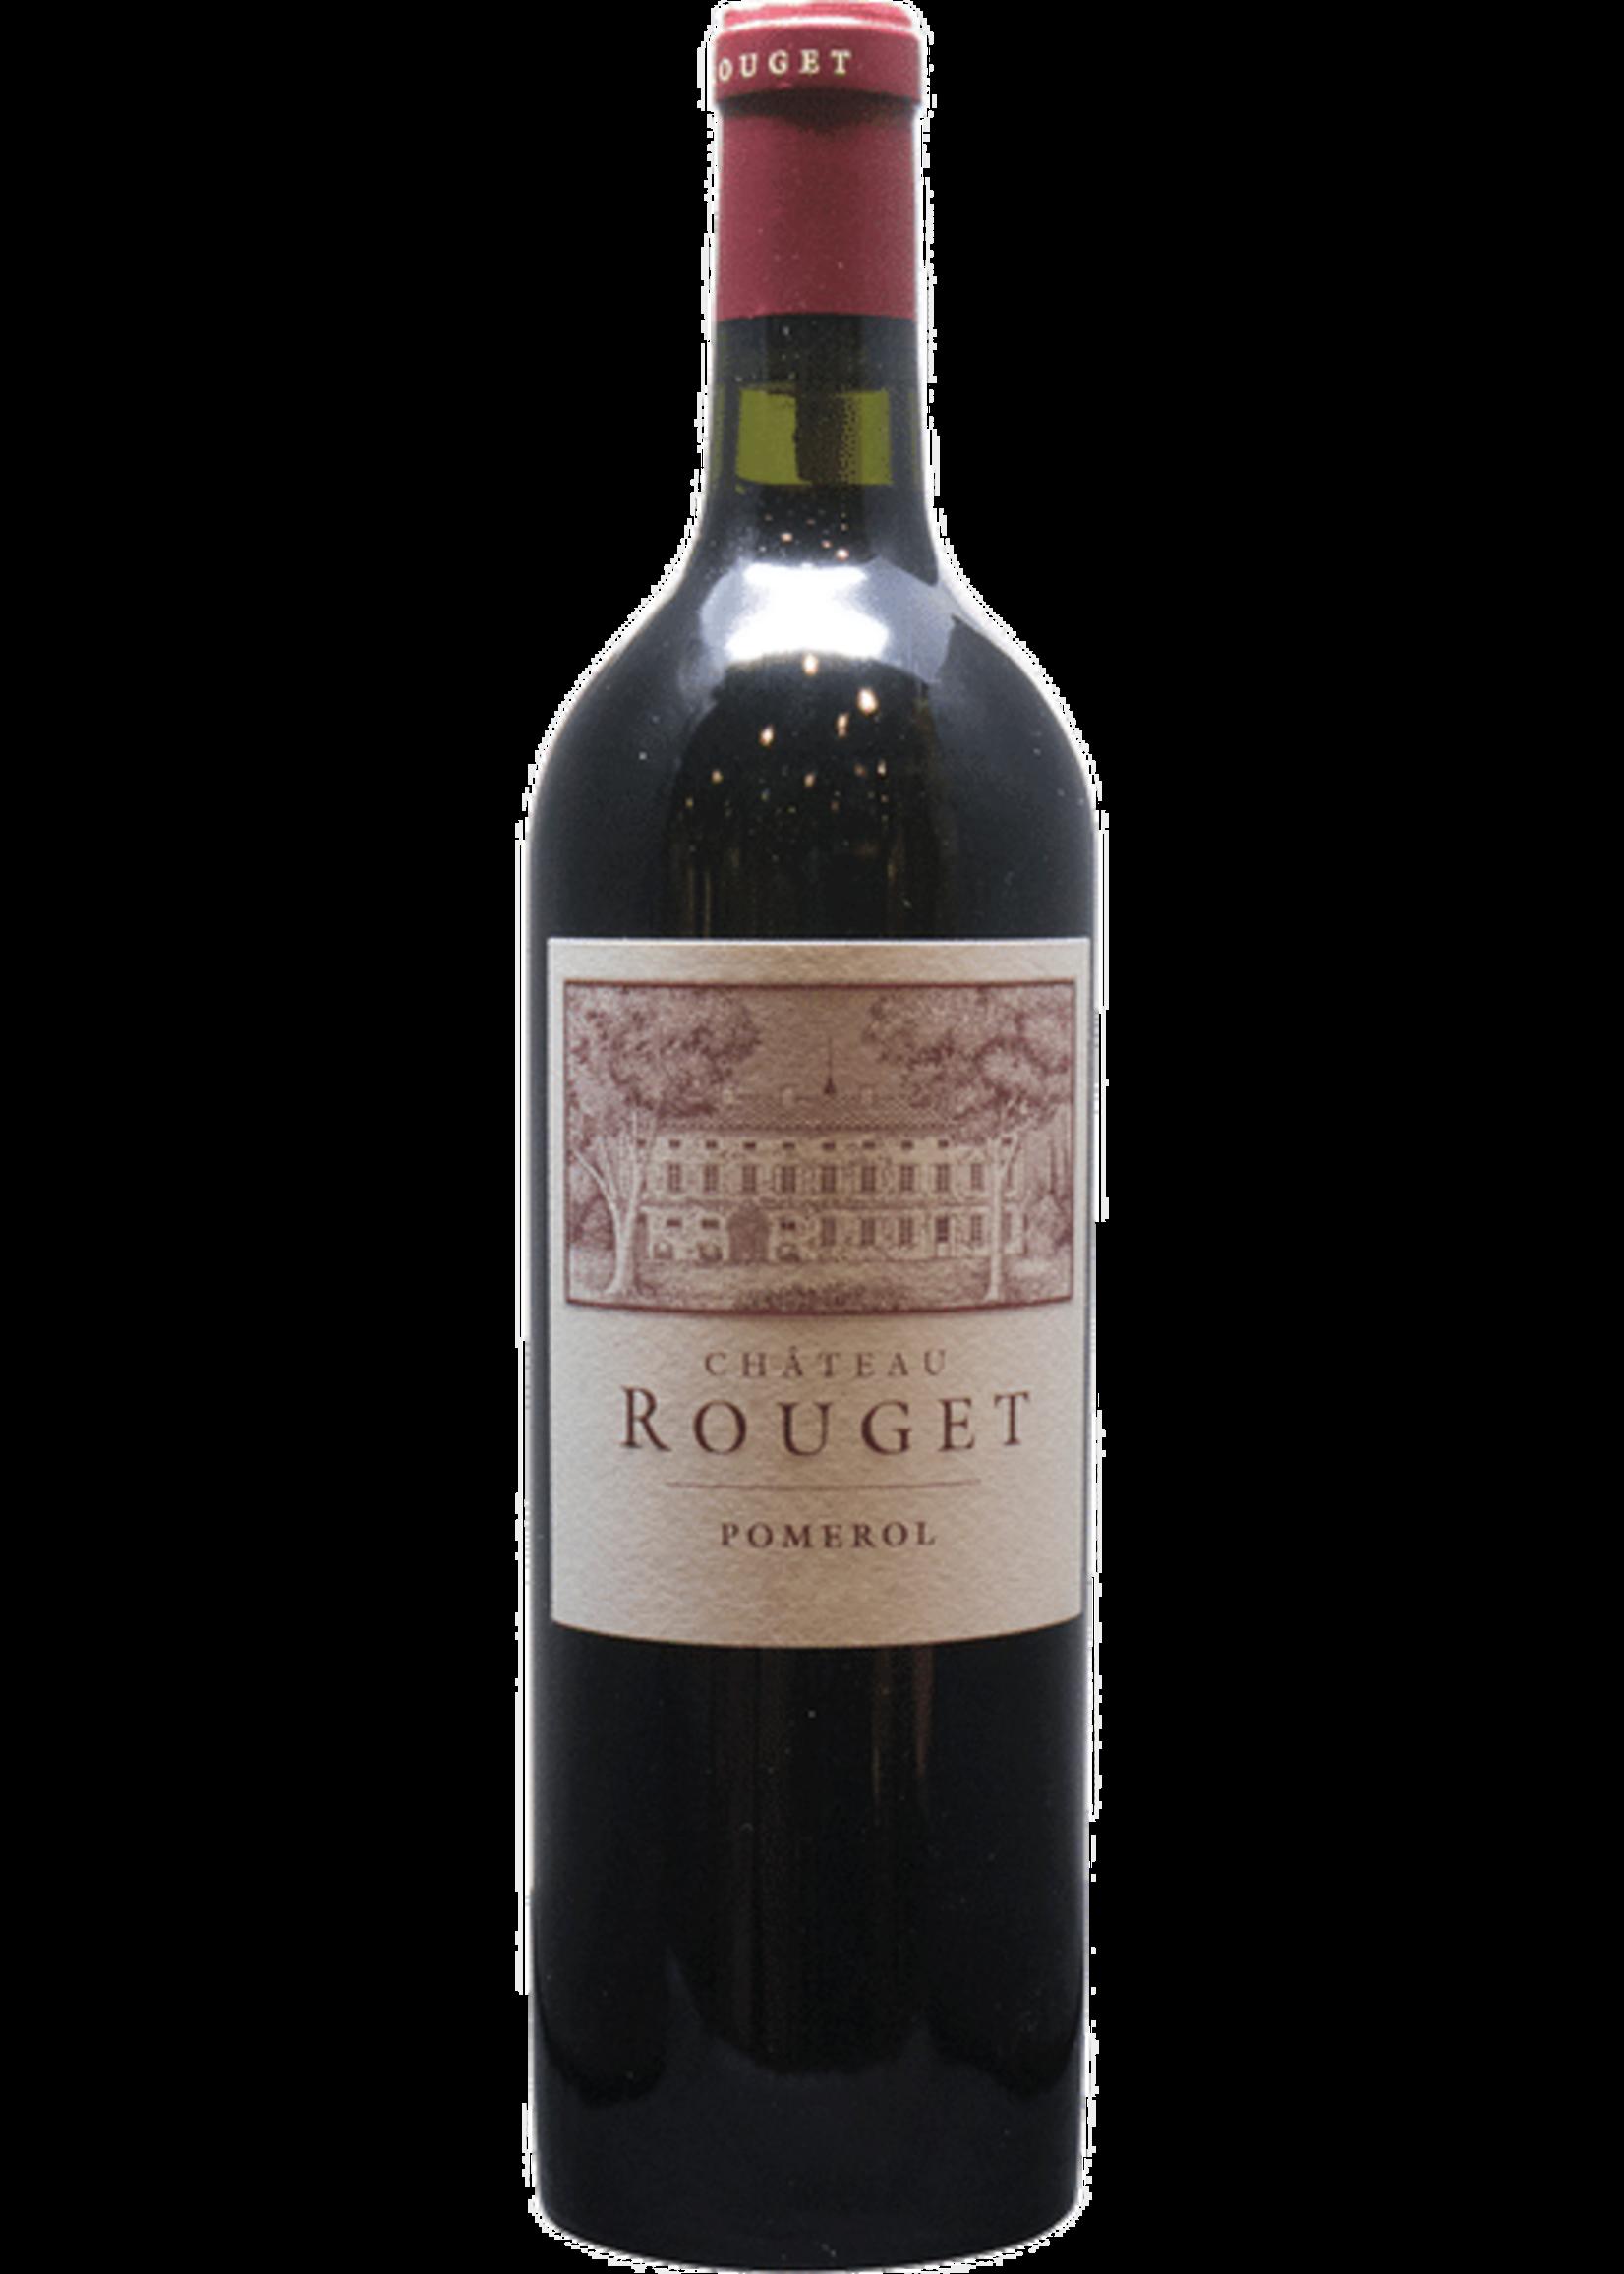 Chateau Rouget Château Rouget / Pomerol 2014 / 750mL